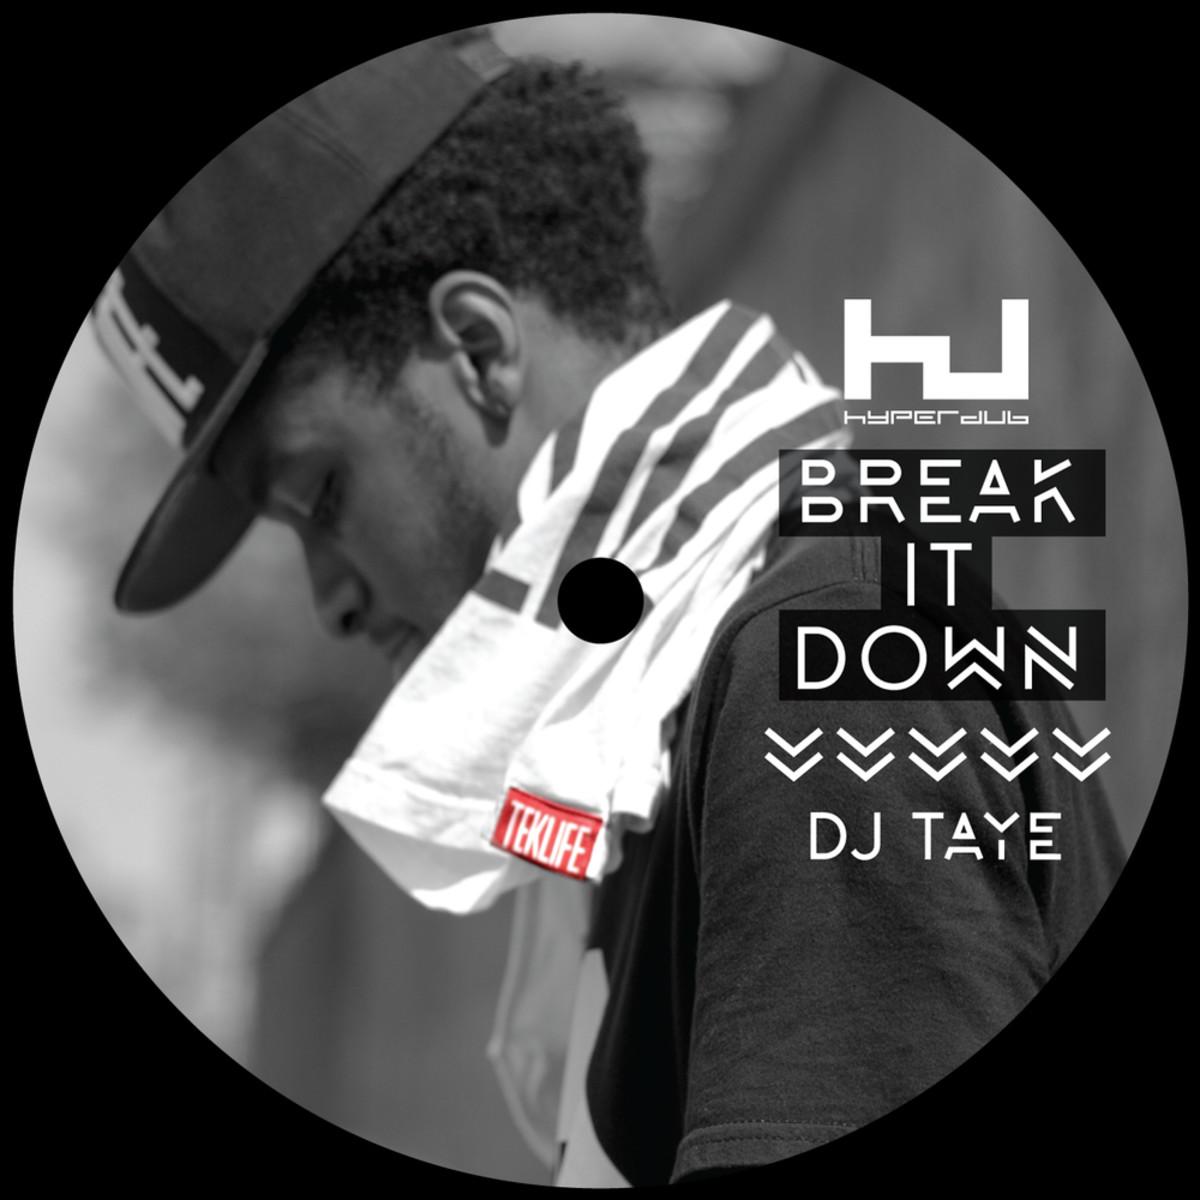 DJ Taye Break It Down EP